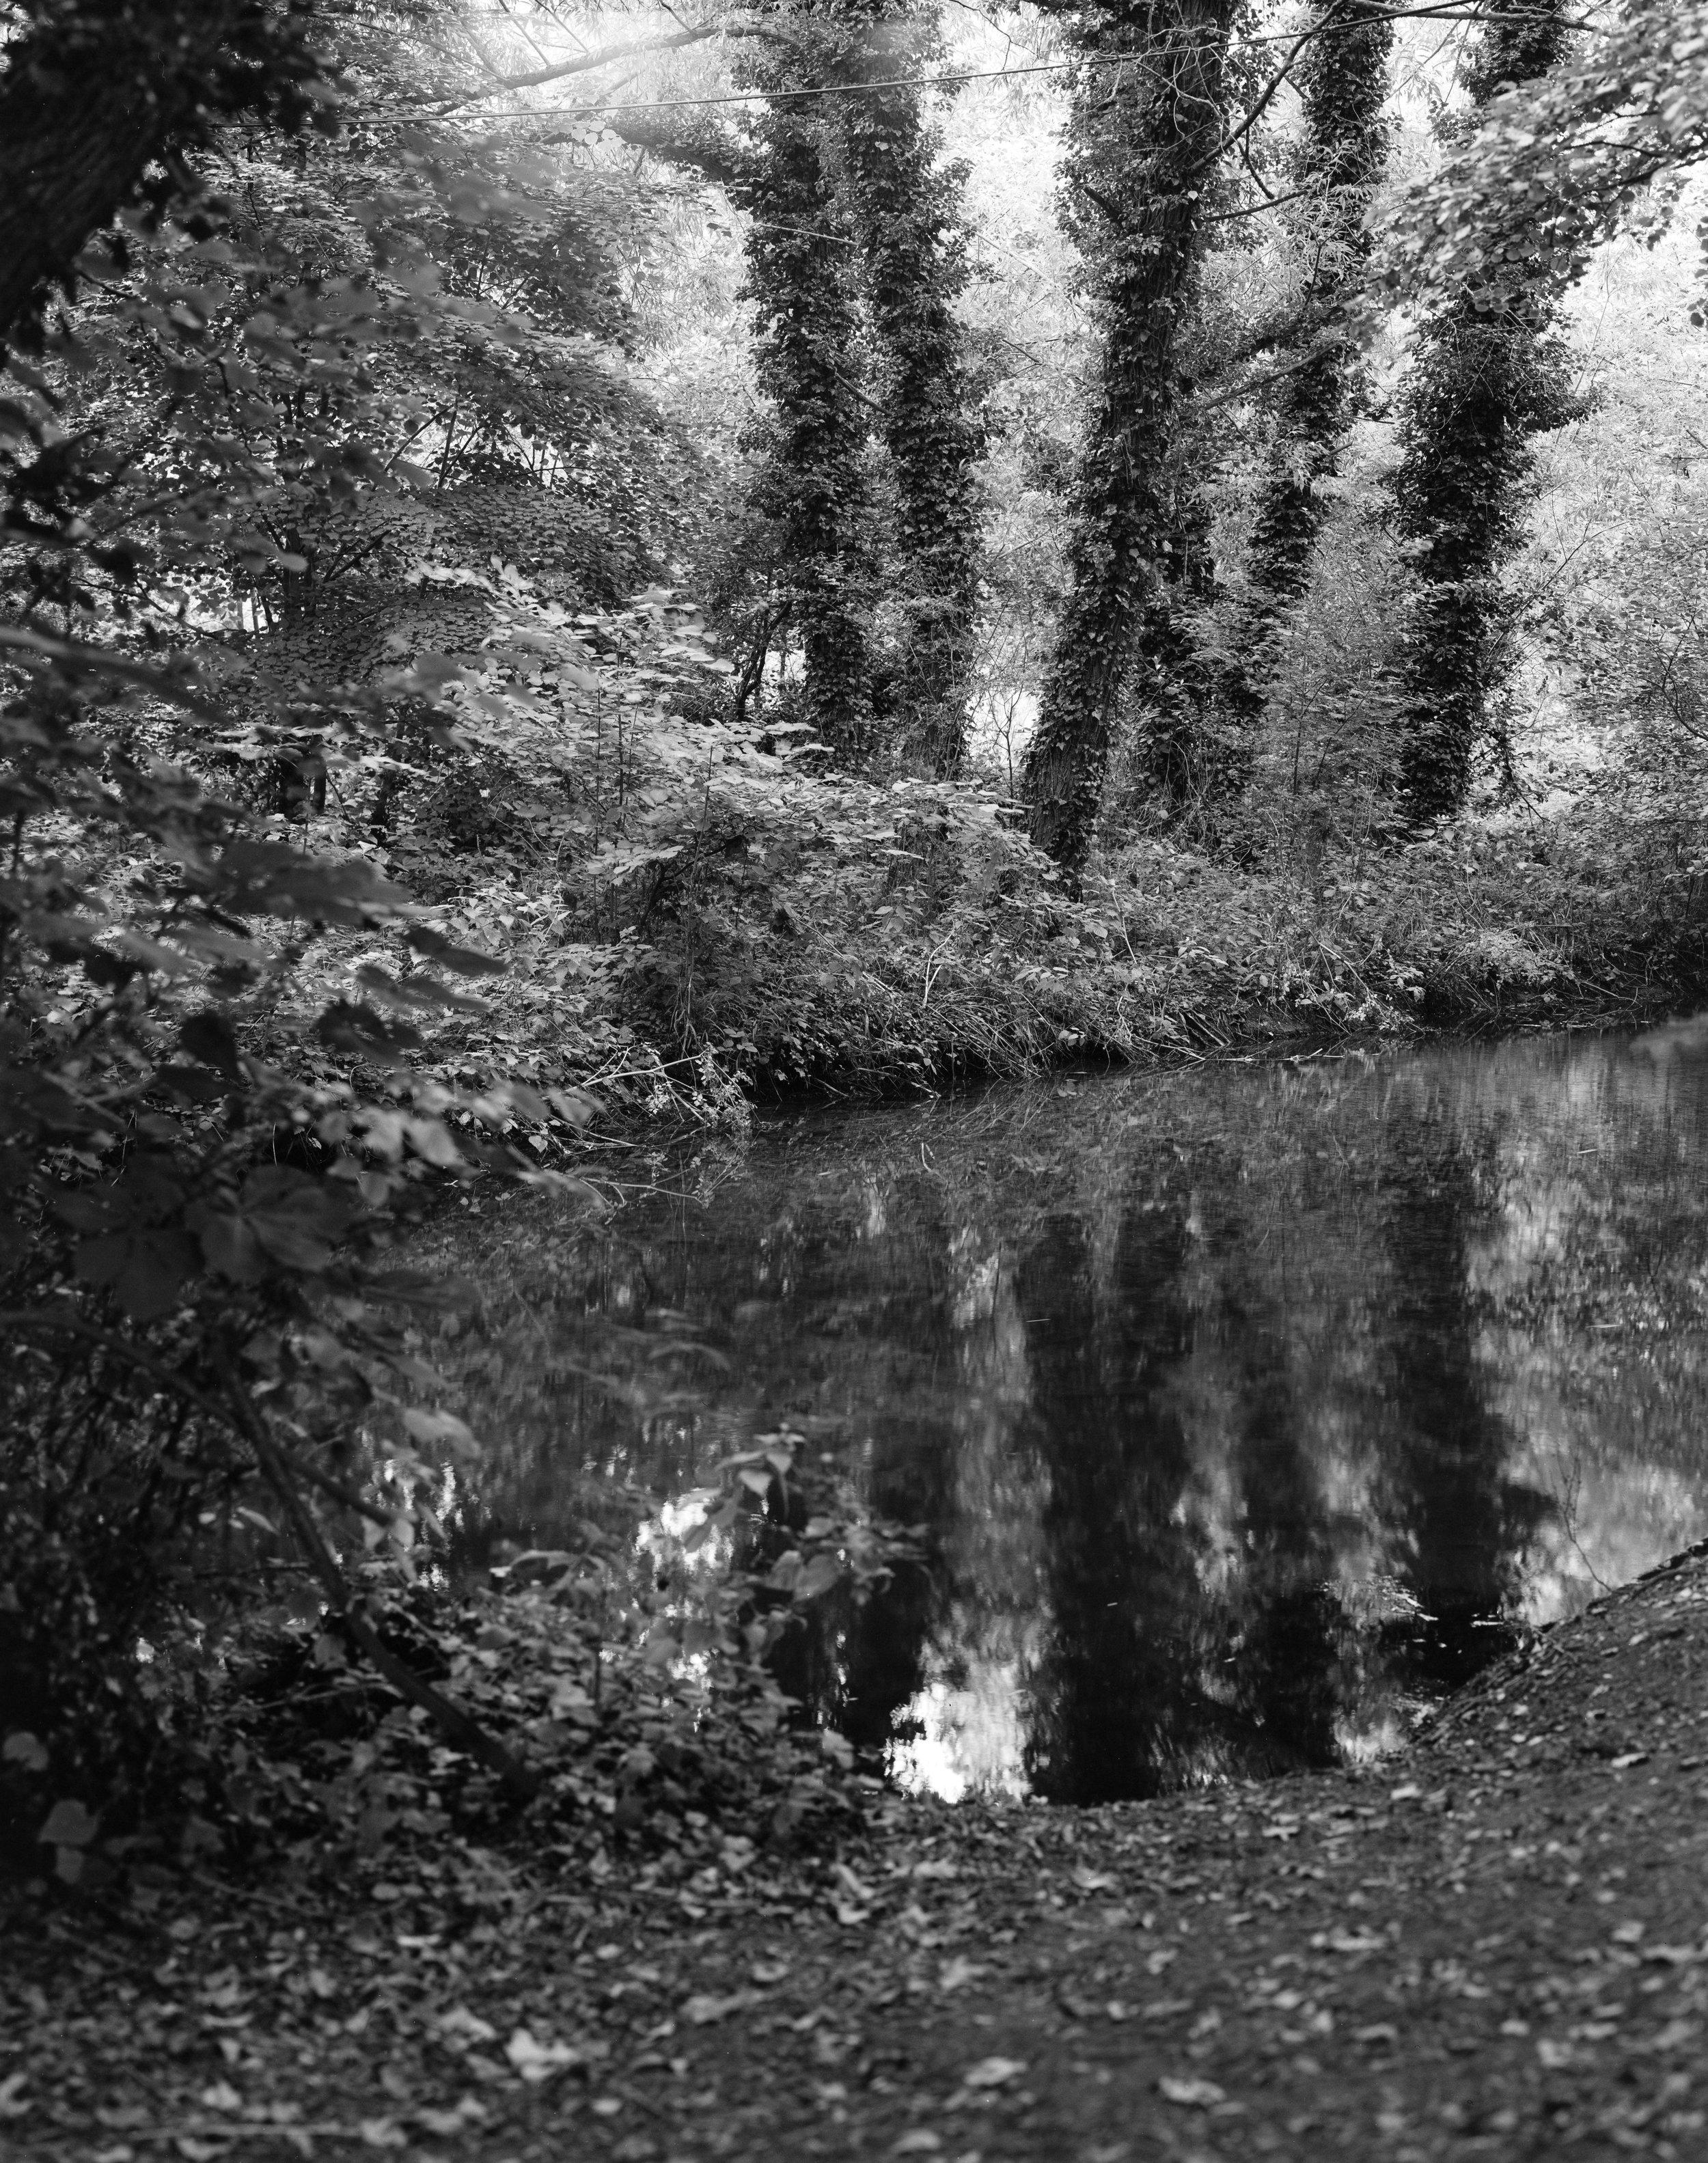 Trees reflected in the River Darent   Shen Hao TZ45-II, Schneider Symmar-S 180mm, Adox 100 CHS II